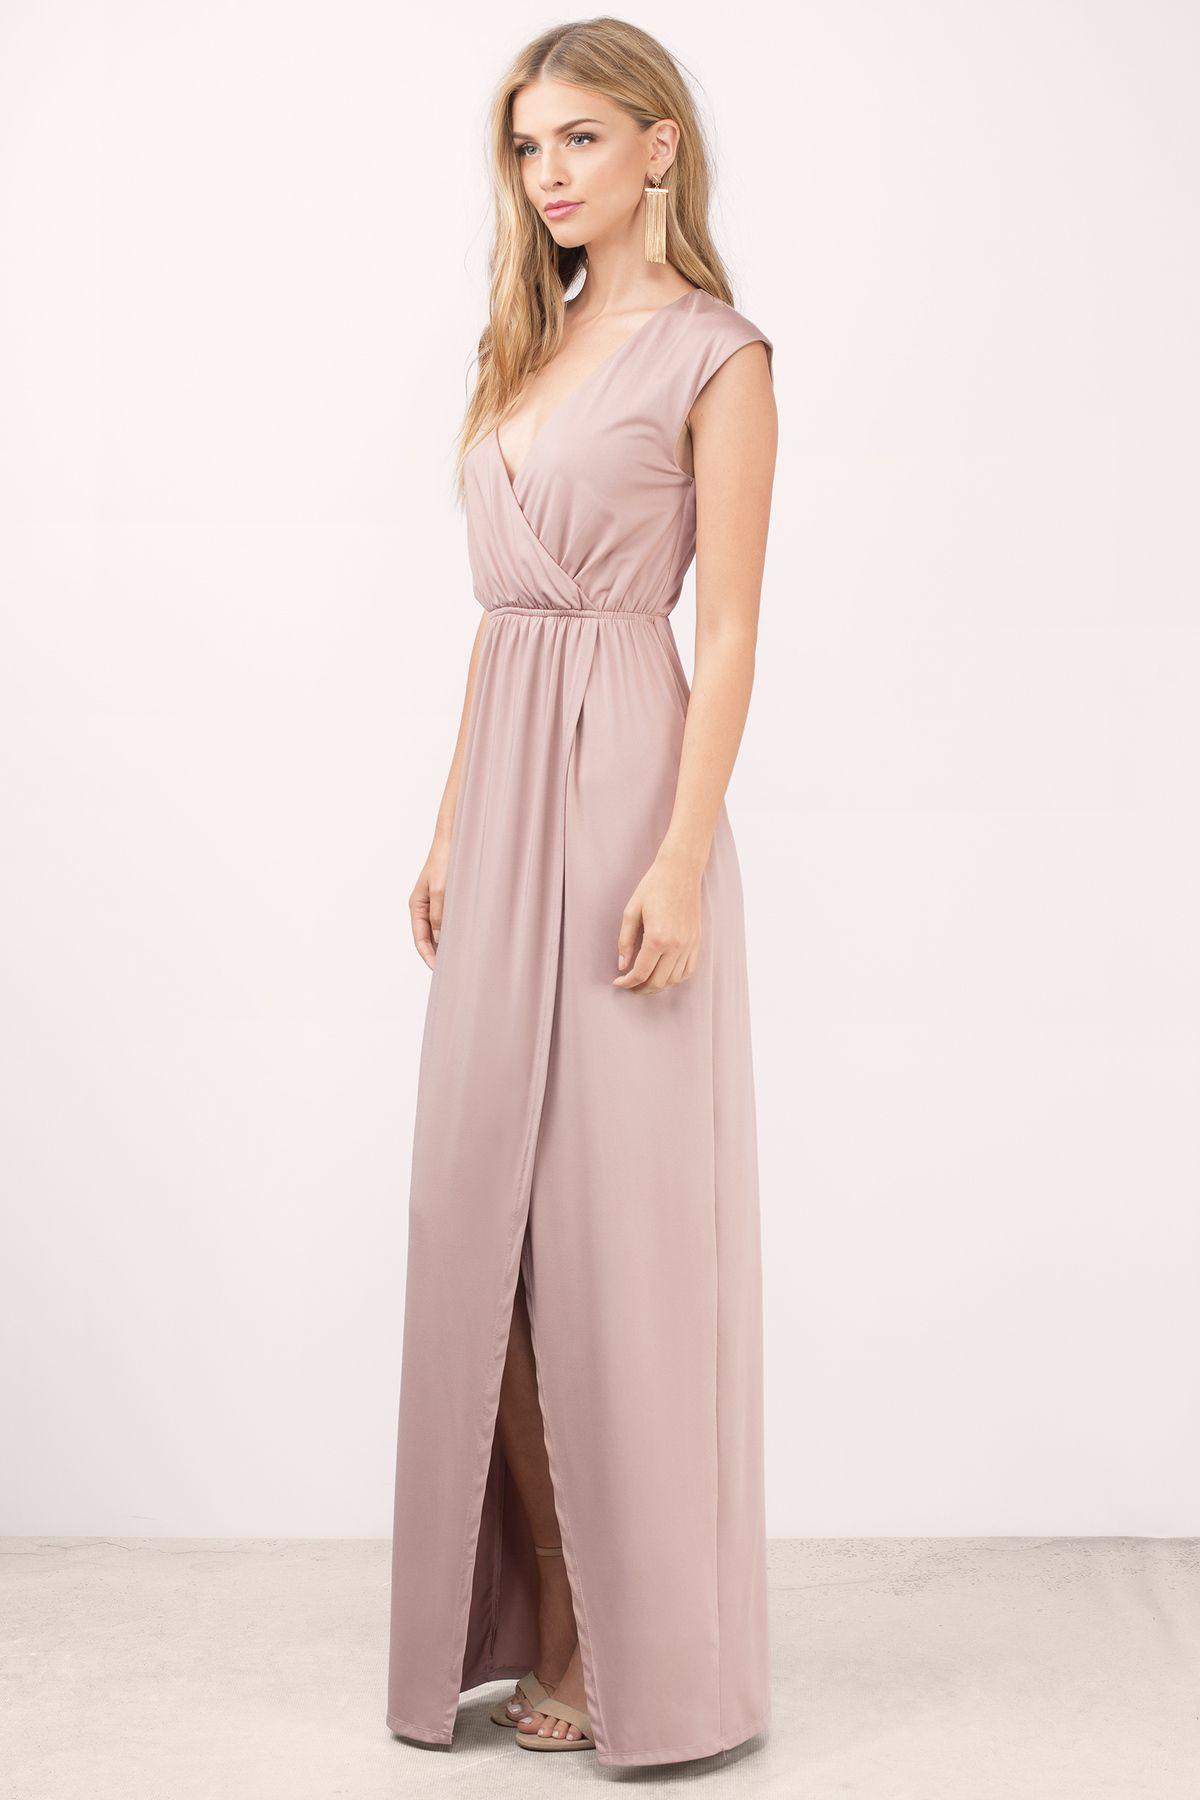 Bridesmaid Dresses, Tobi, Mauve What I Need Slit Maxi Dress ...